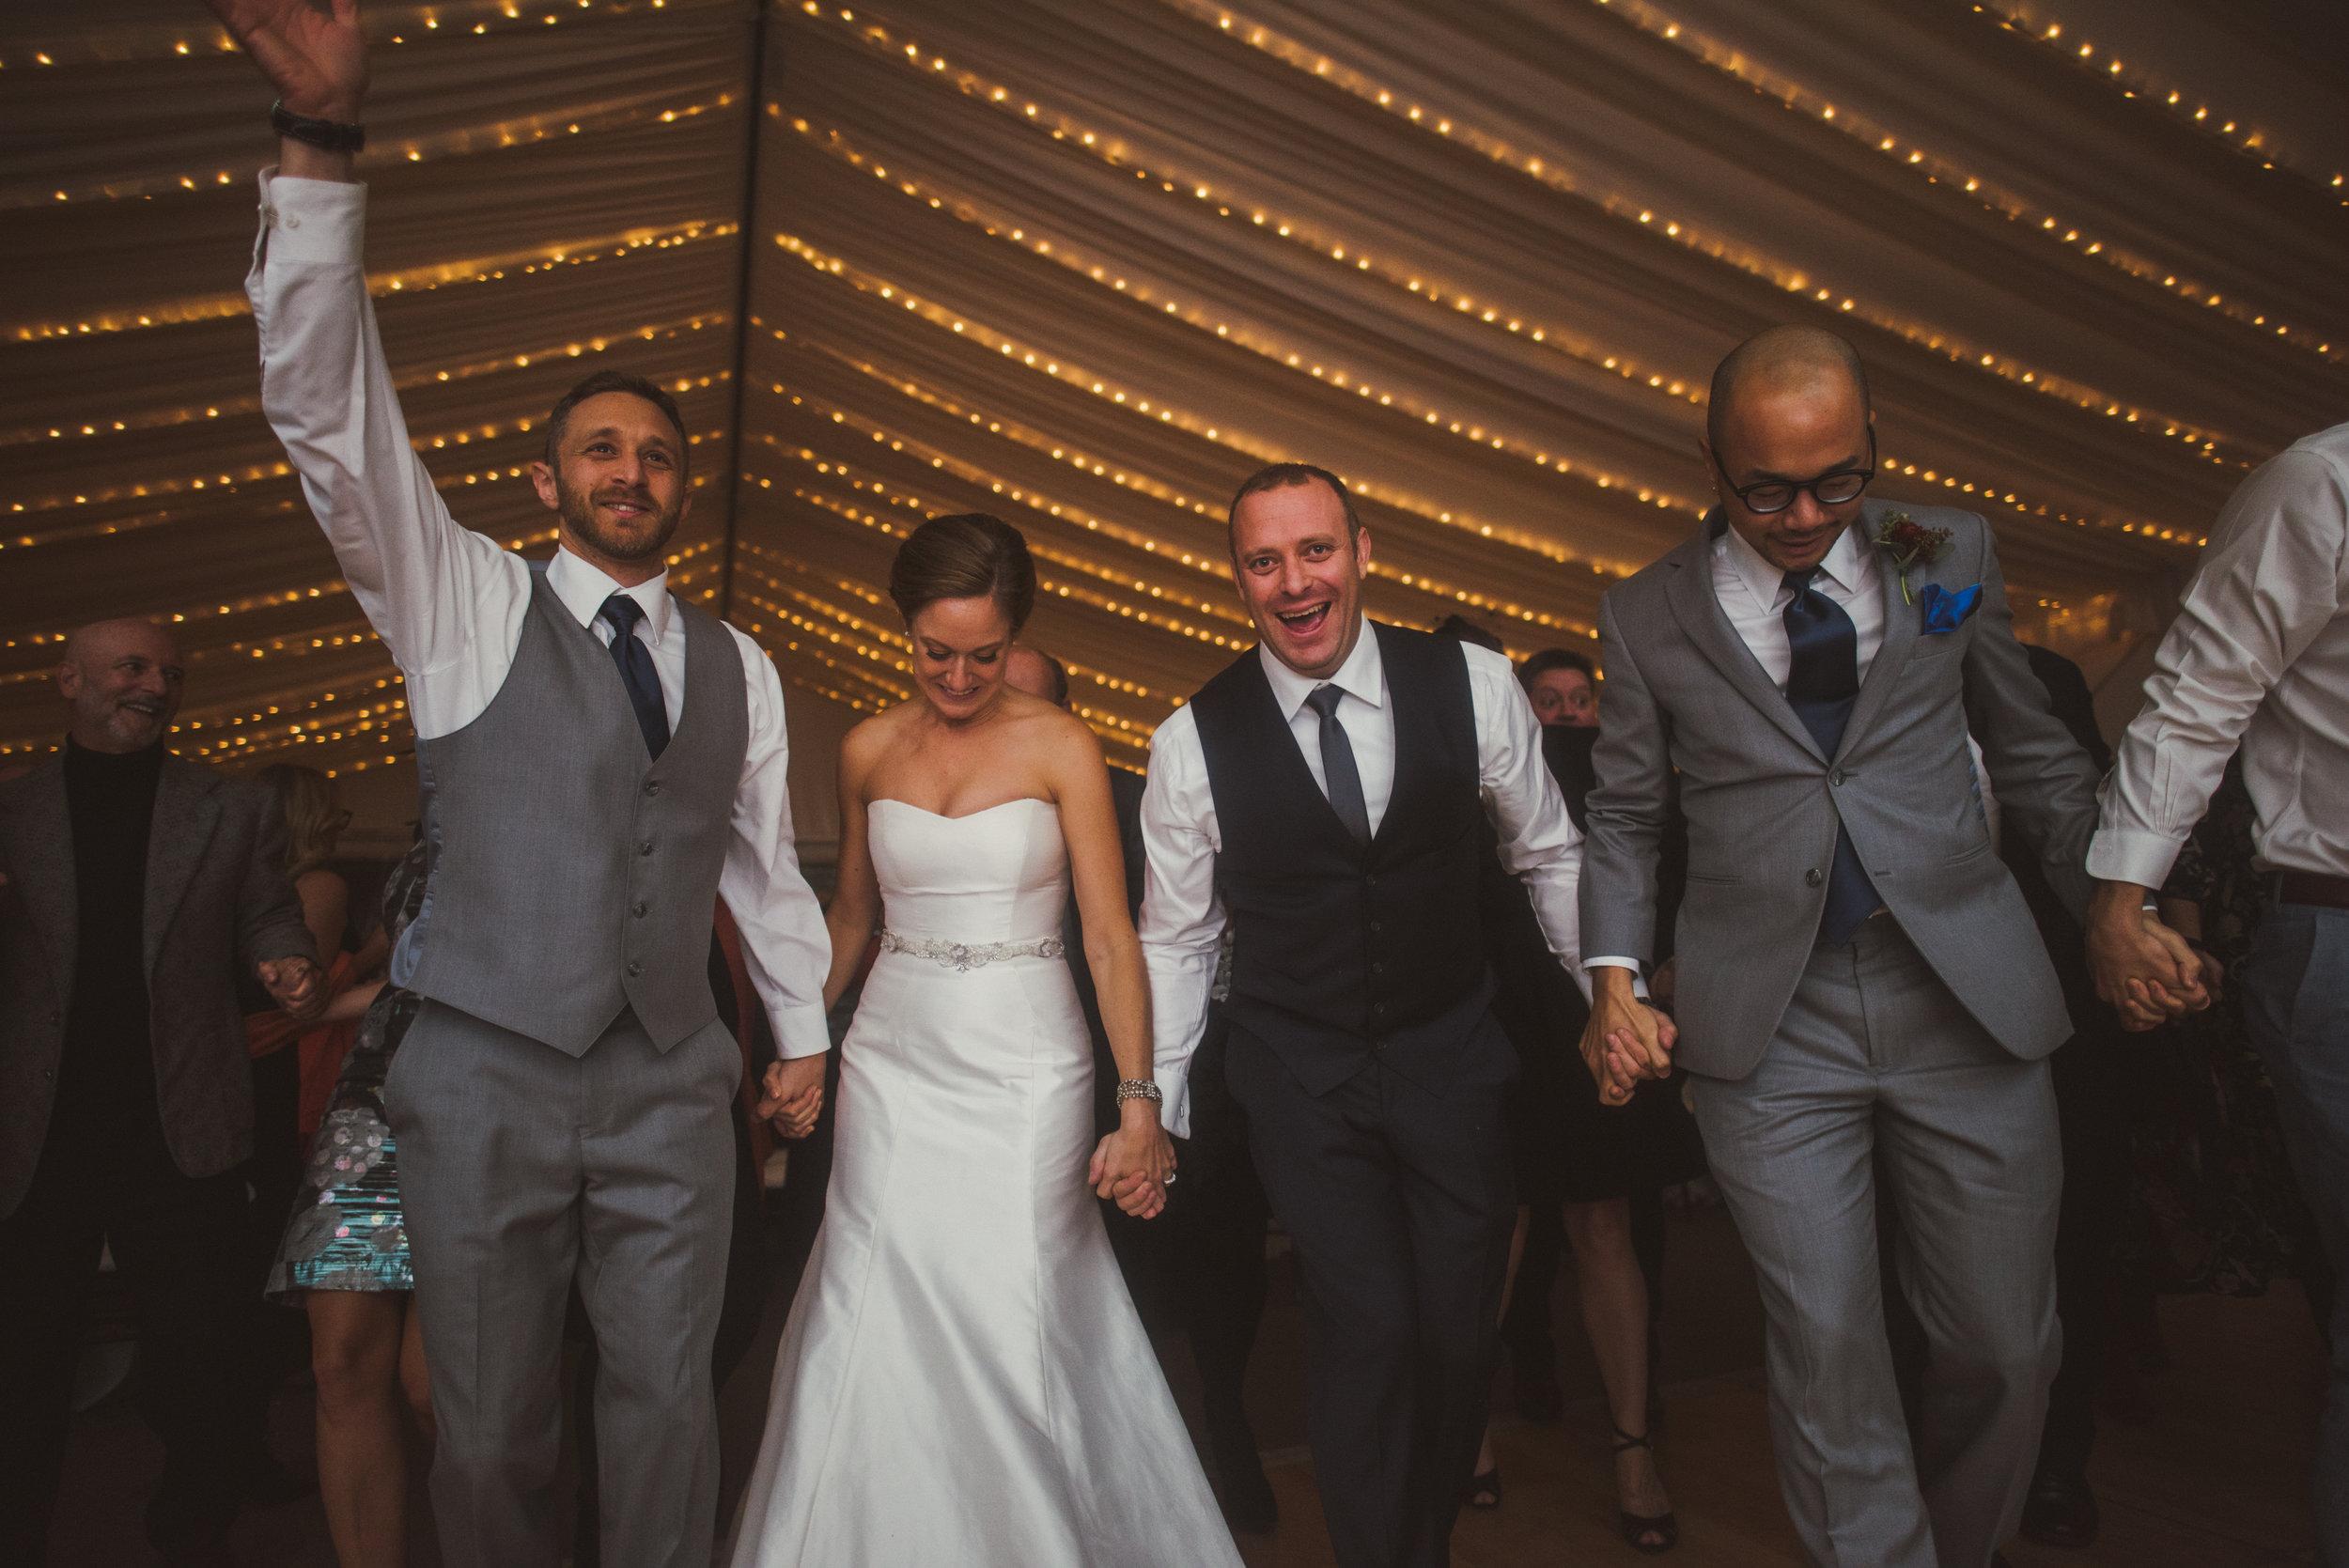 JACQUELINE & ANDREW WARSHAWER -BROOKMILL FARM FALL WEDDING - INTIMATE WEDDING PHOTOGRAPHER - TWOTWENTY by CHI-CHI AGBIM-659.jpg